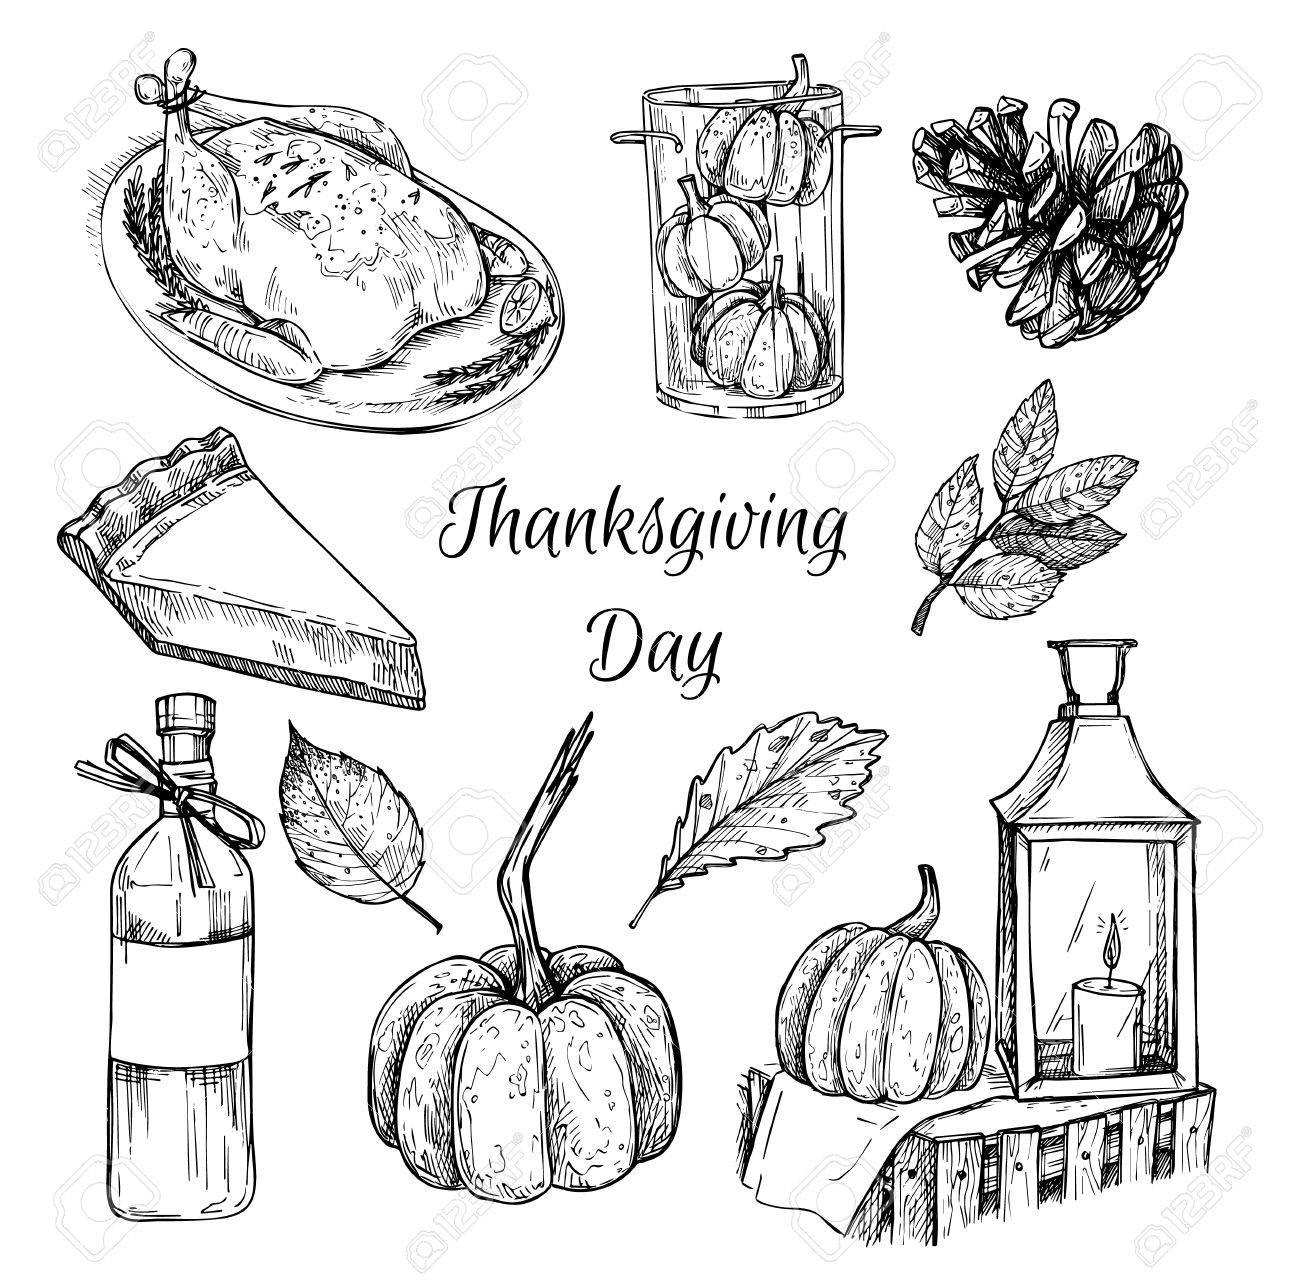 Hand Drawn Vector Illustration Thanksgiving Day Design Elements